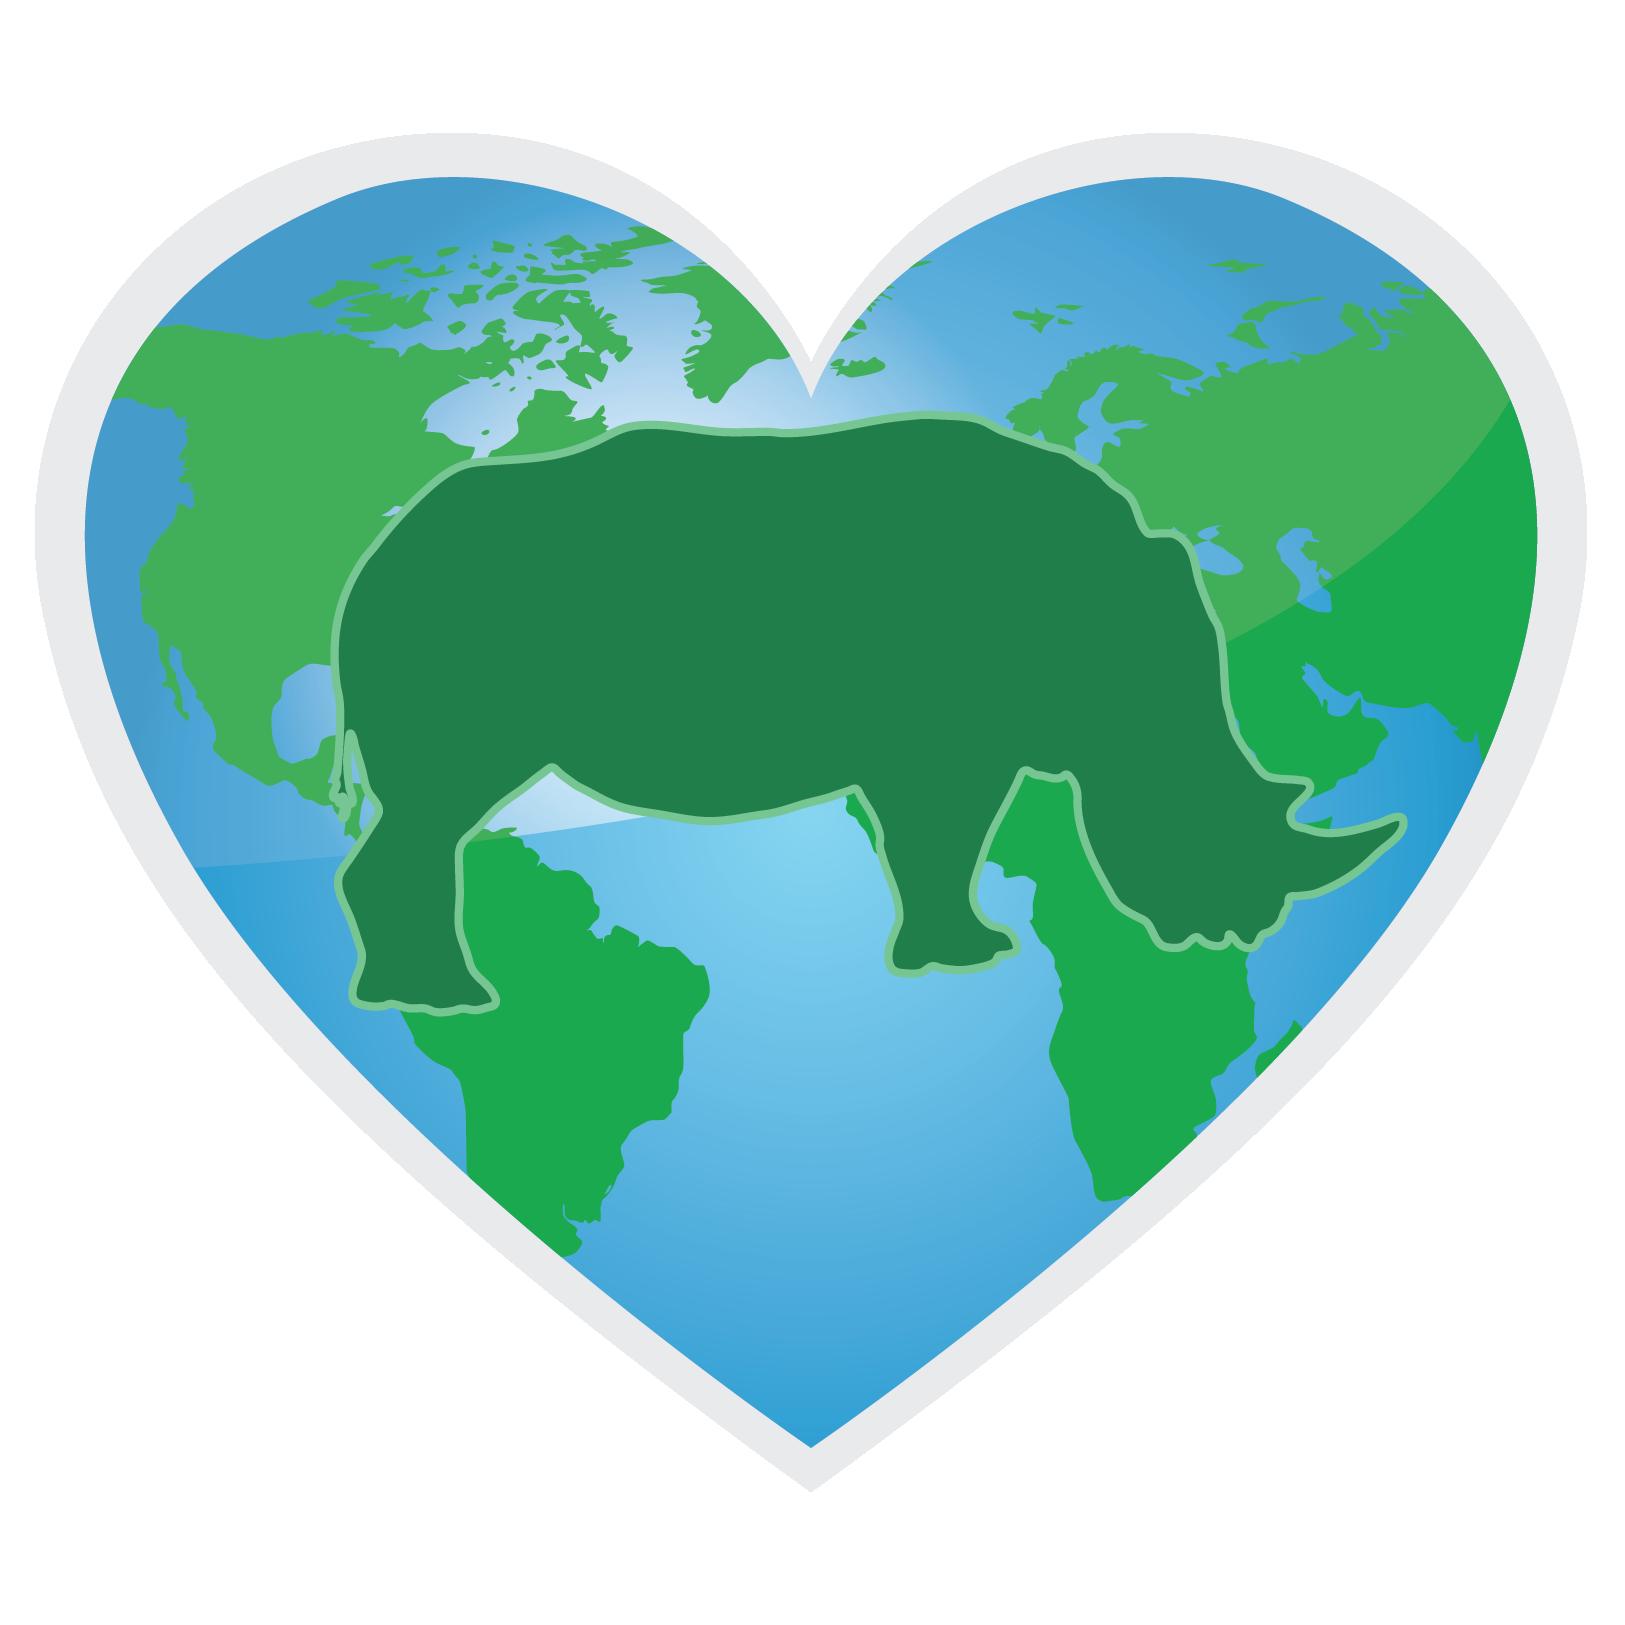 TPWF_heart_rhino_300dpi